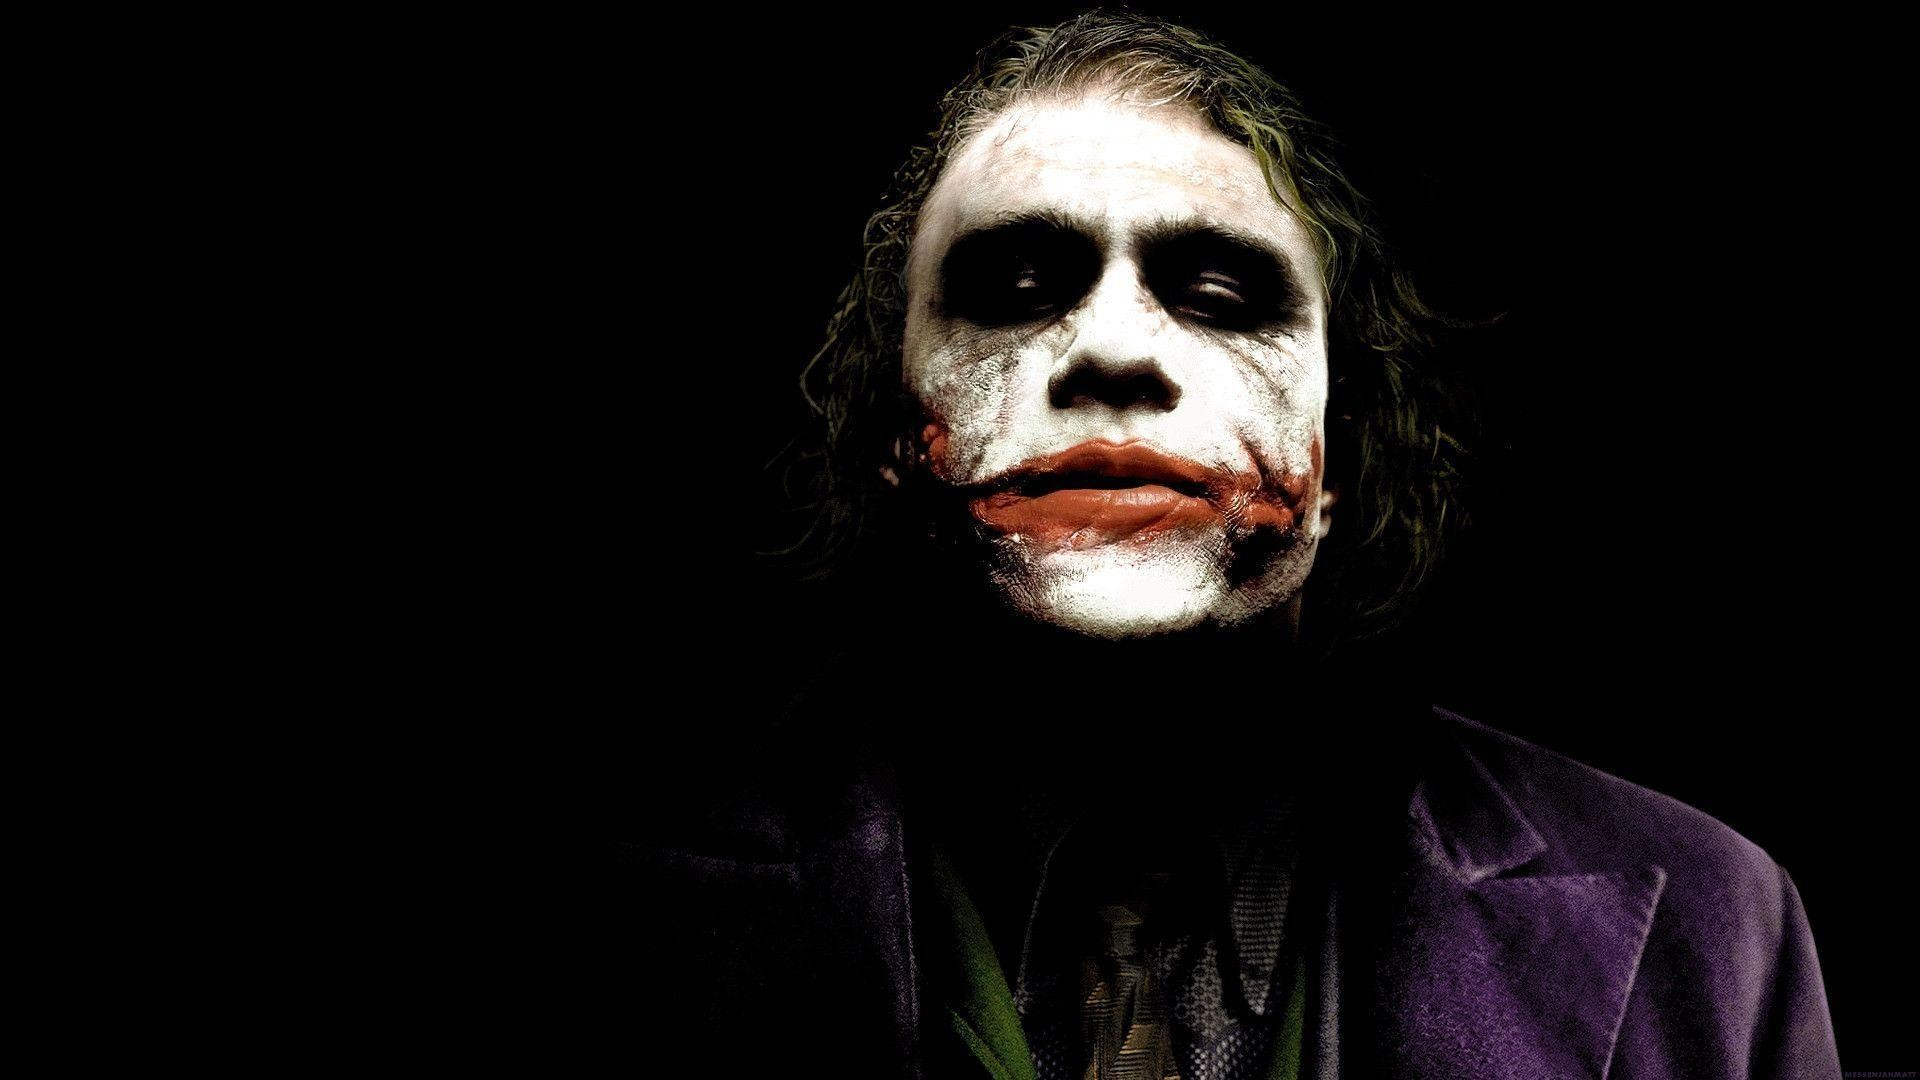 analysis of the joker